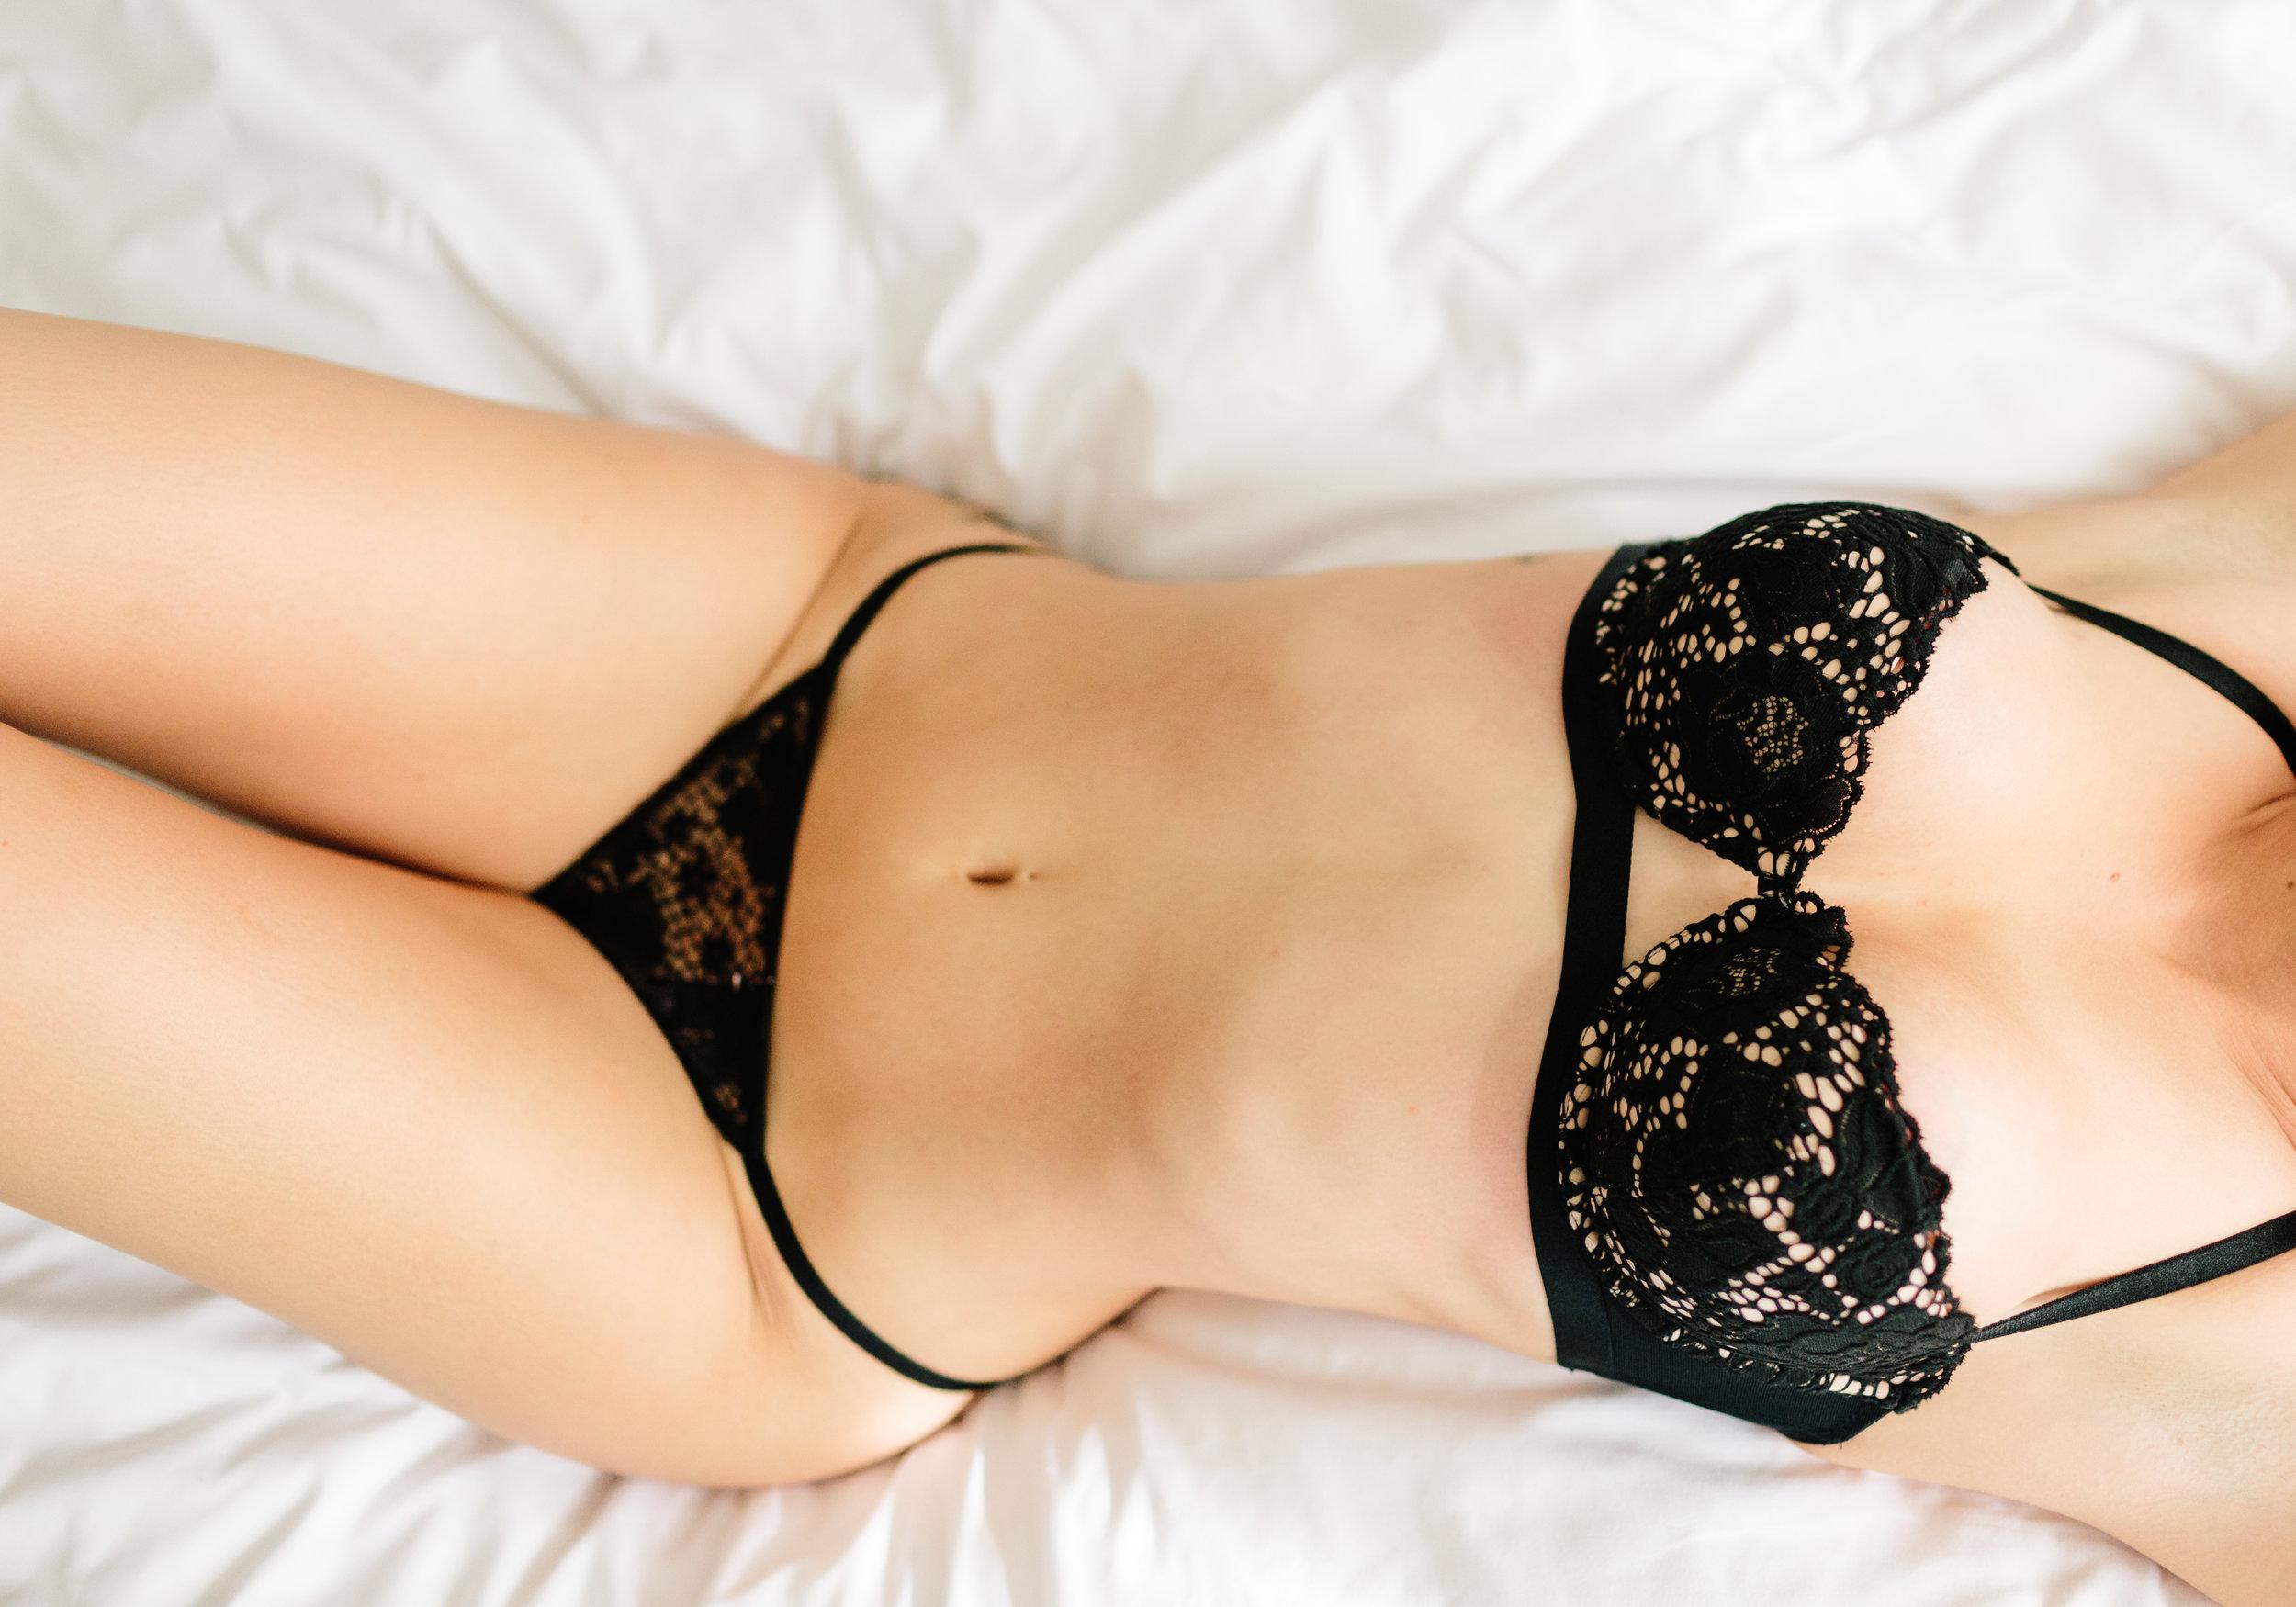 Victorias secret black lingerie on white sheets boudoir session